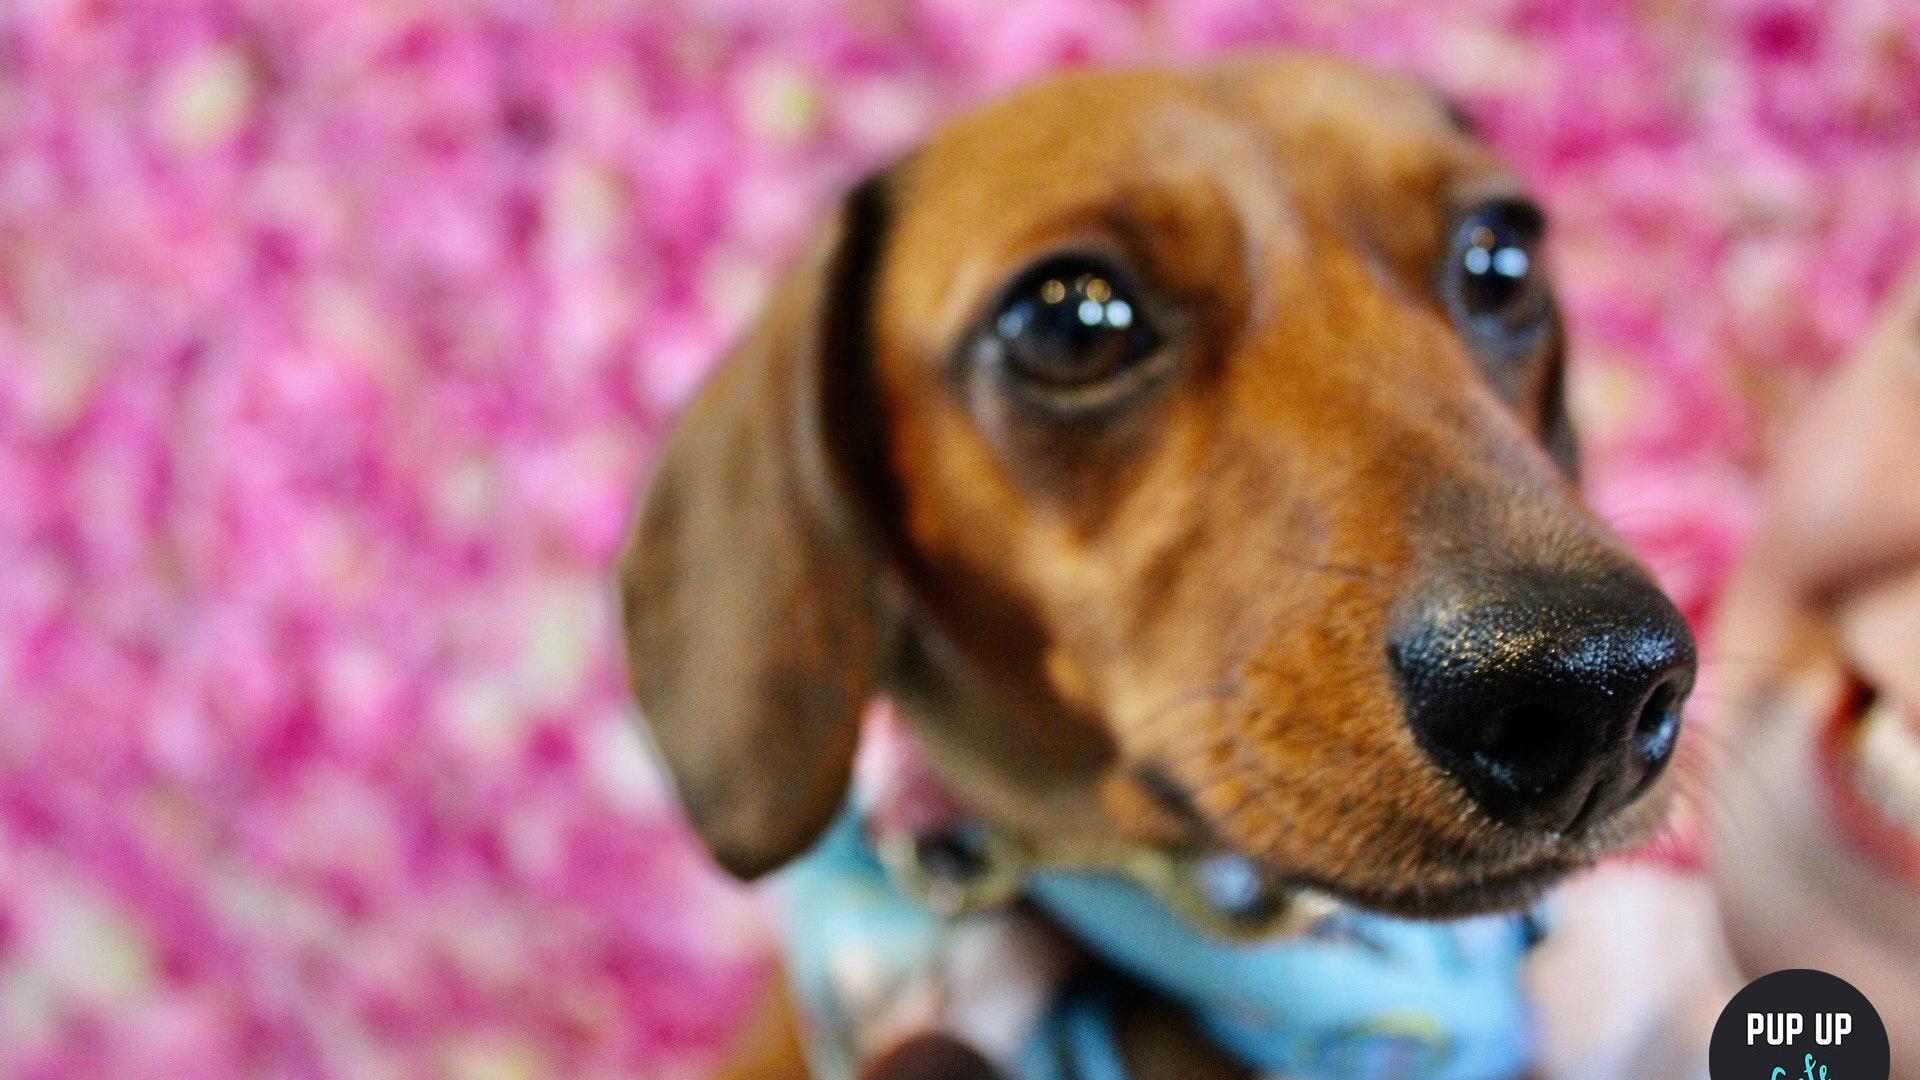 Dachshund Pup Up Cafe – Leeds